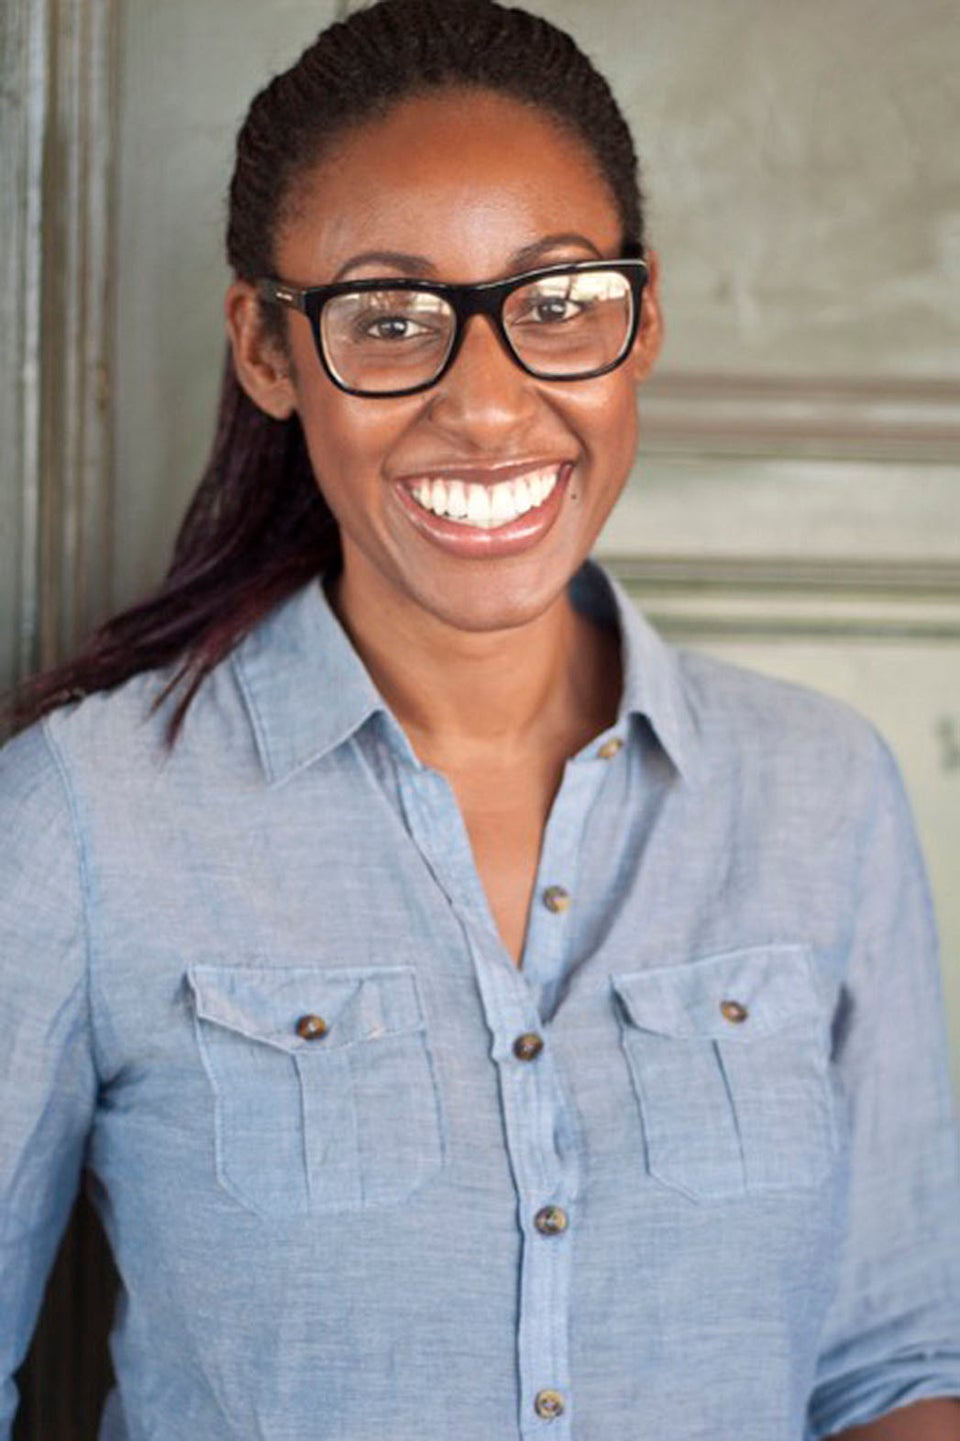 #BlackGirlMagic: Tamara Hunter Named Vice President of Casting At Sony